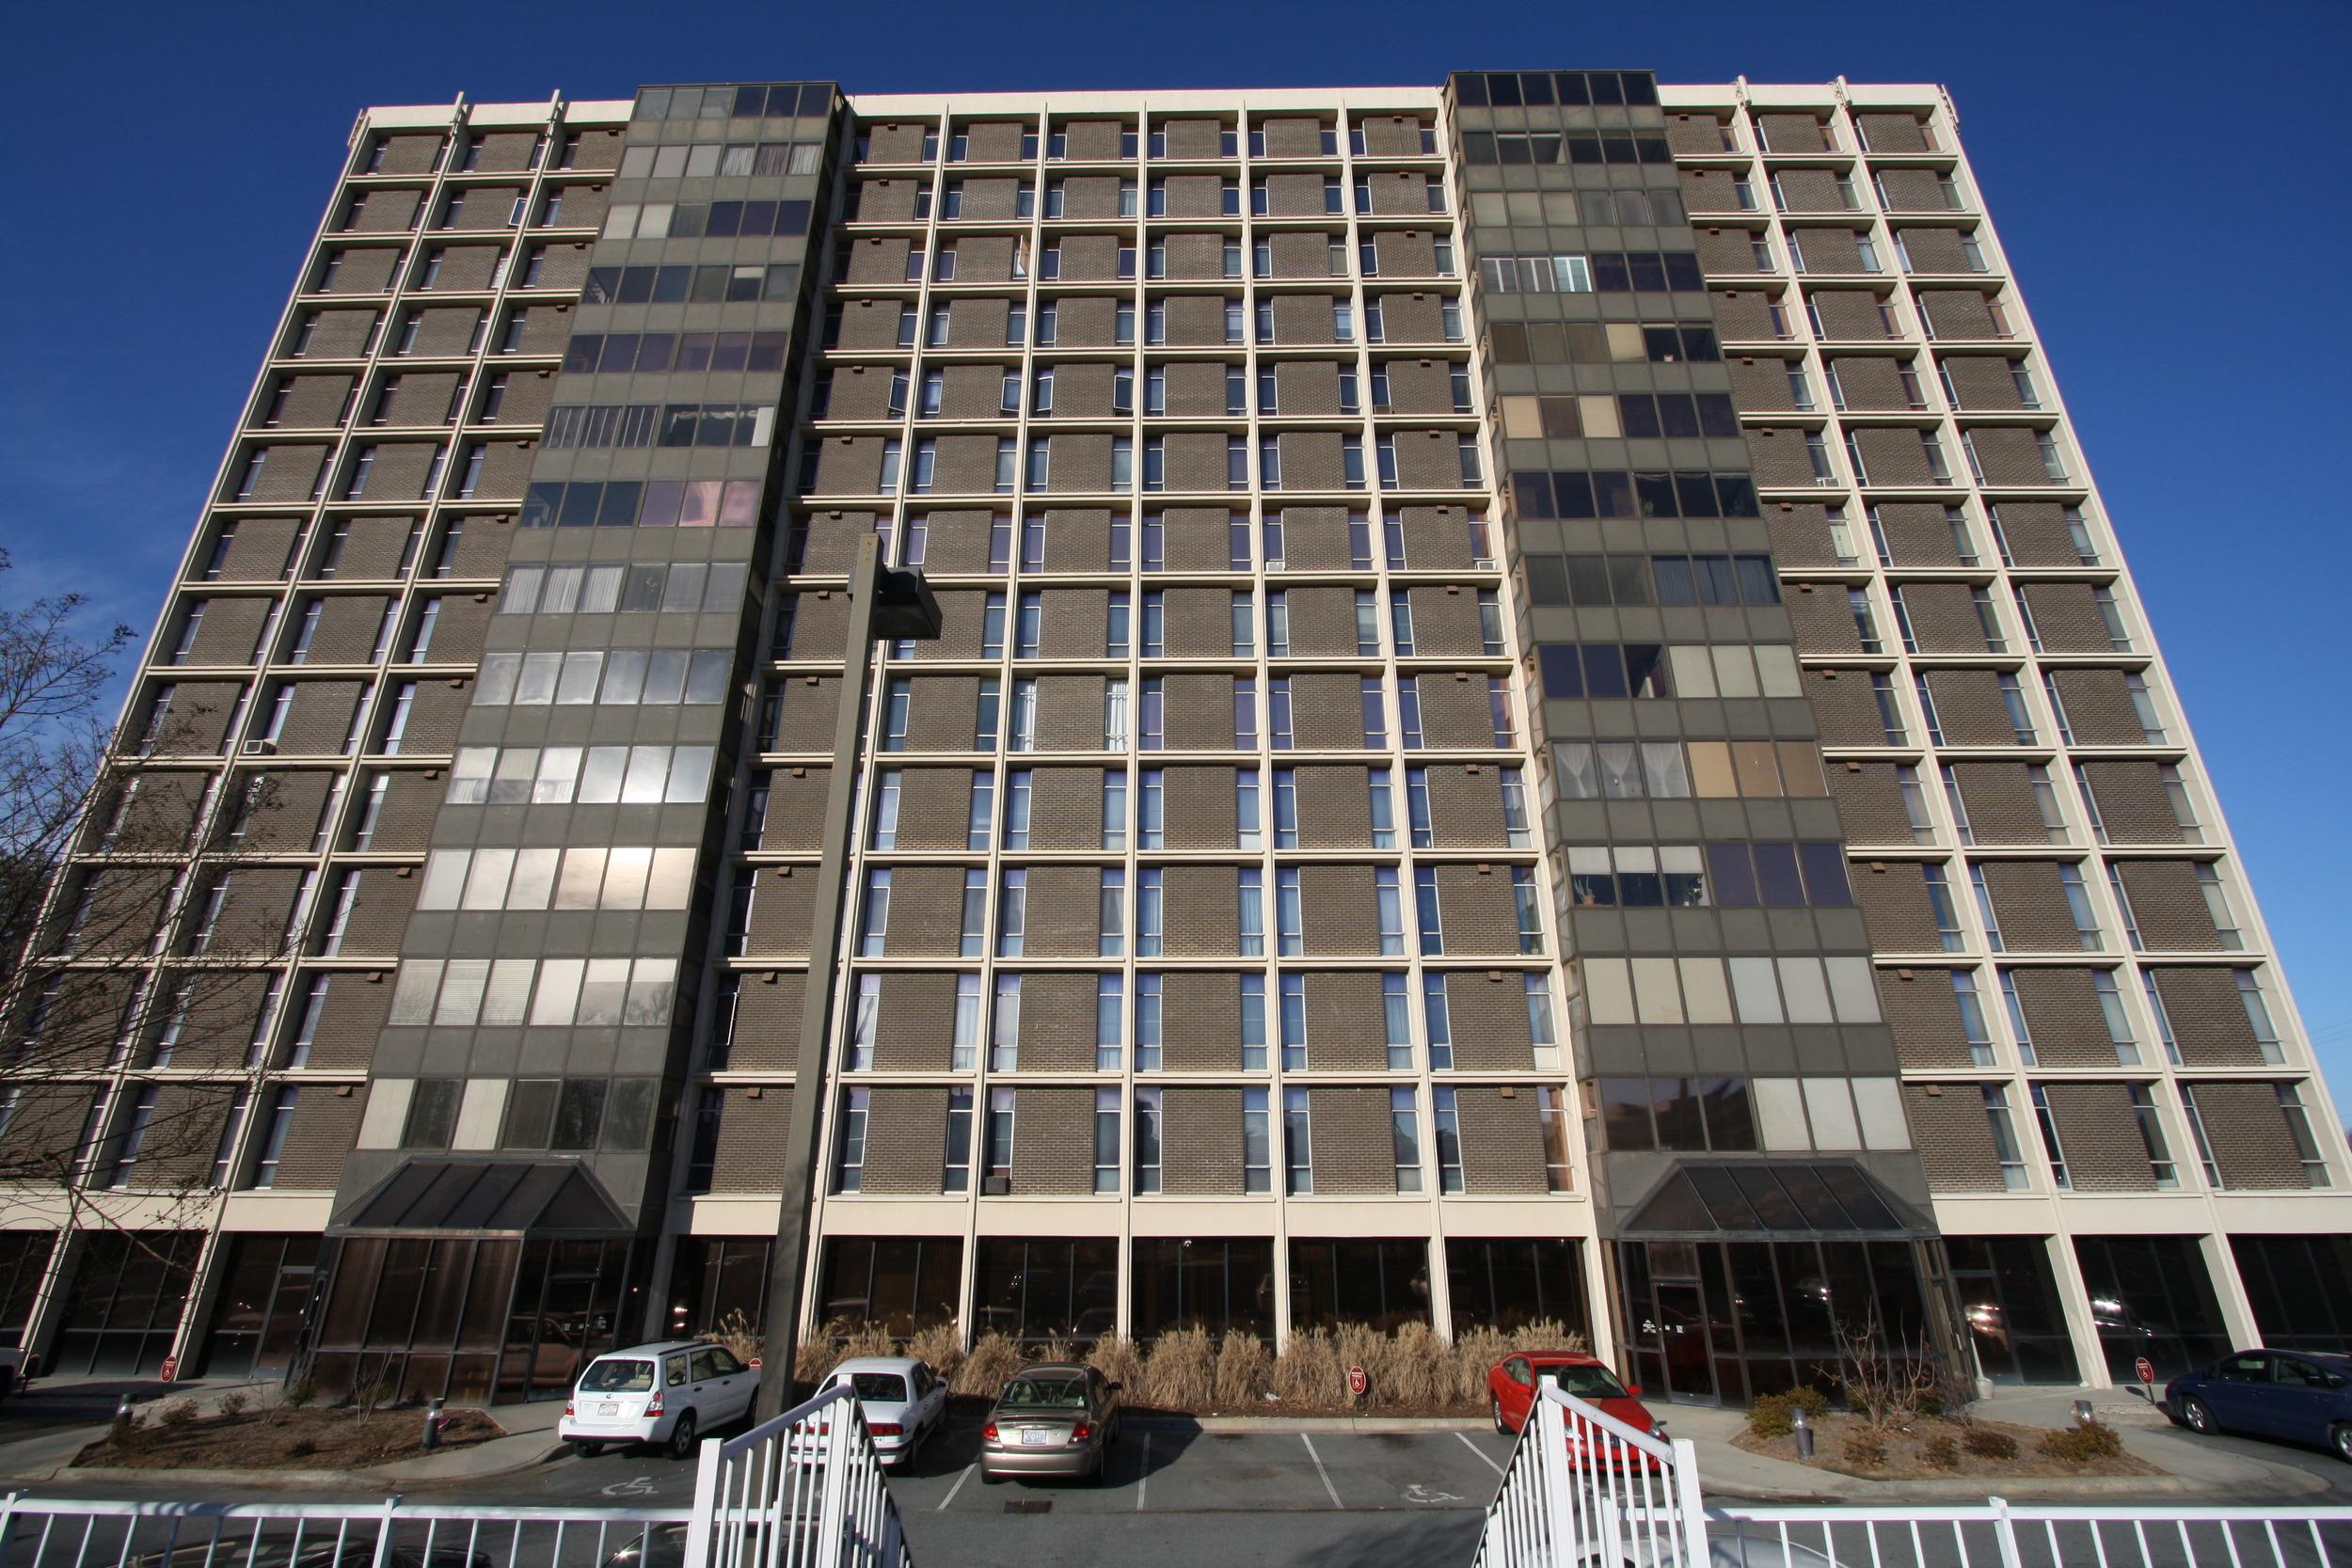 The Hampshire Condominiums - Greensboro, NC - Built in 1963 - 14 Stories - Modernism Style - Condominium Use